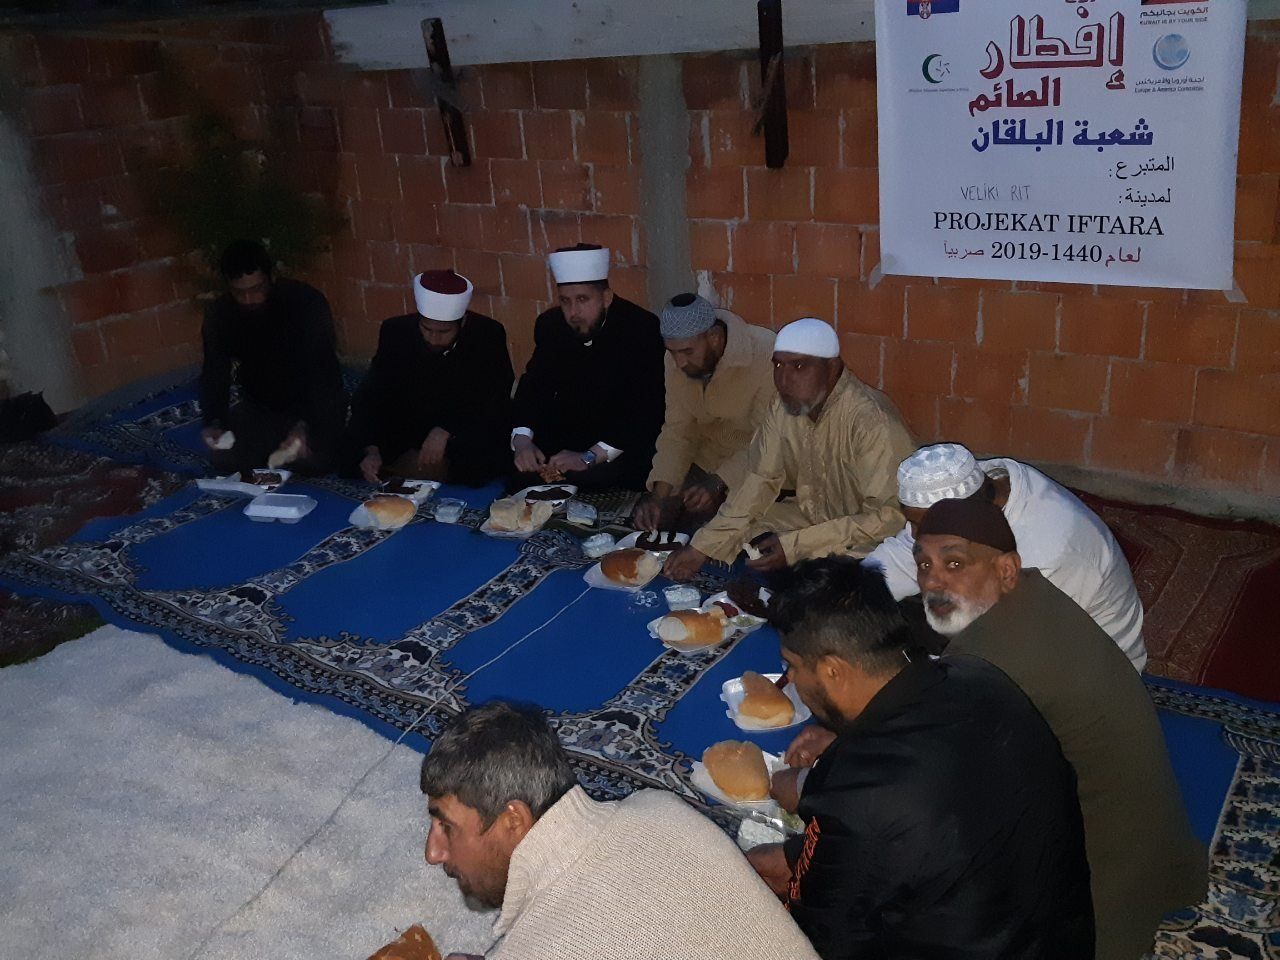 Iftar u džematu Veliki Rit